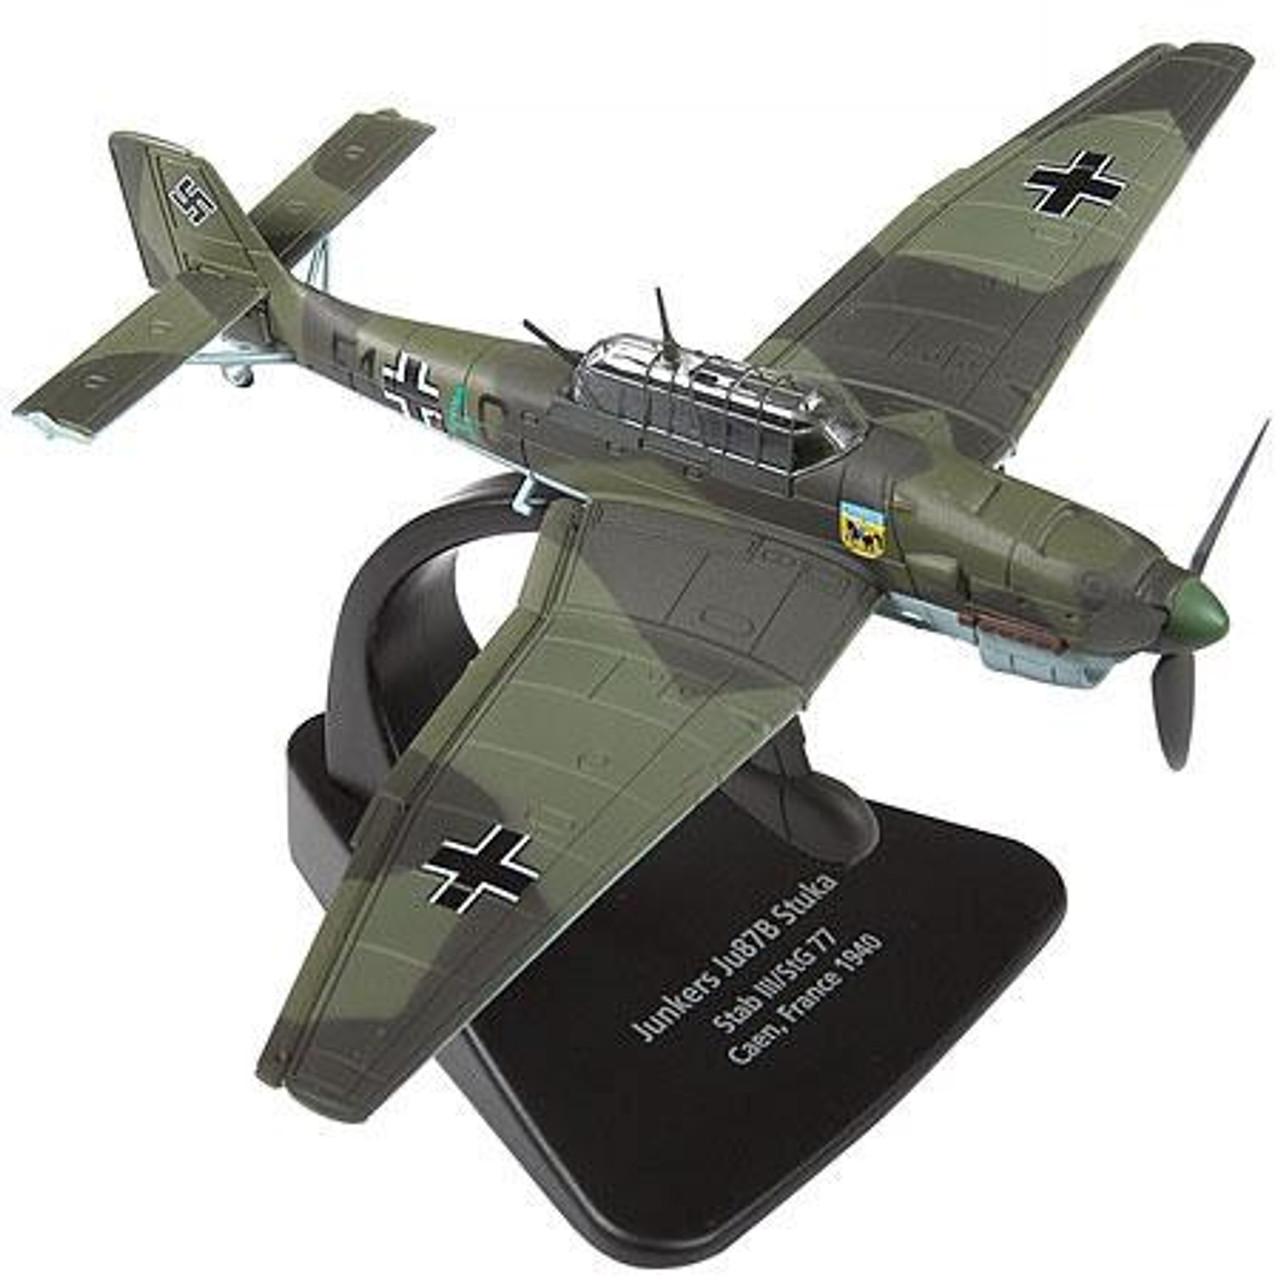 Forces of Valor s of Valor 1:72 Enthusiast Series Planes German Junkers Ju87B Stuka